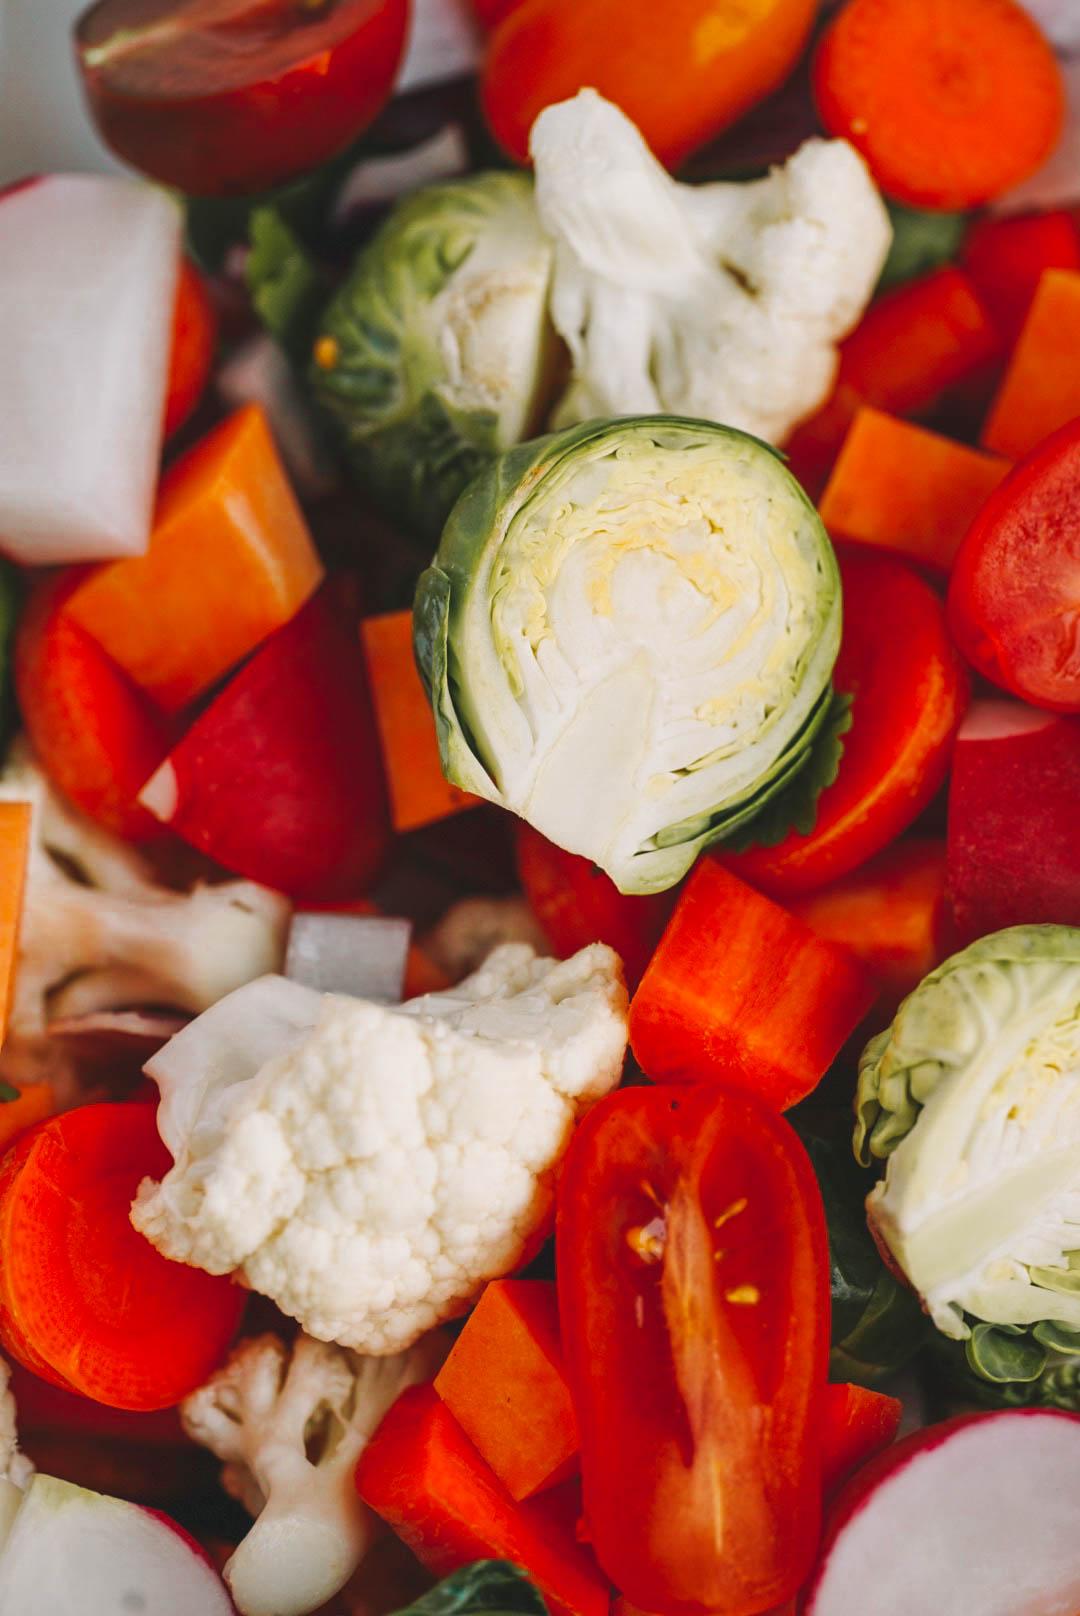 oven-roasted-vegetables